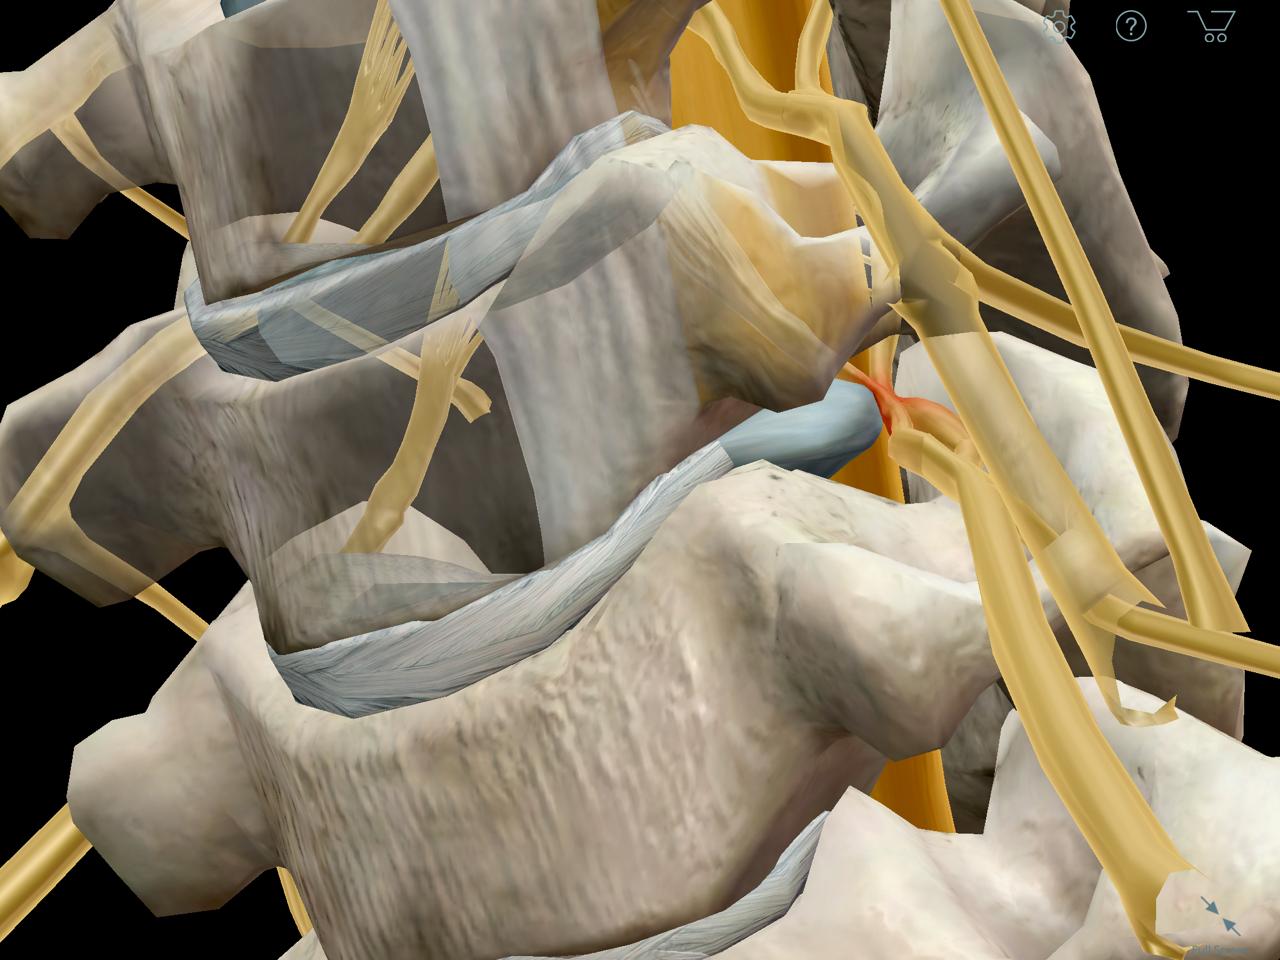 Anatomy Physiology Revealed (apr) App how to make a algorithm ...